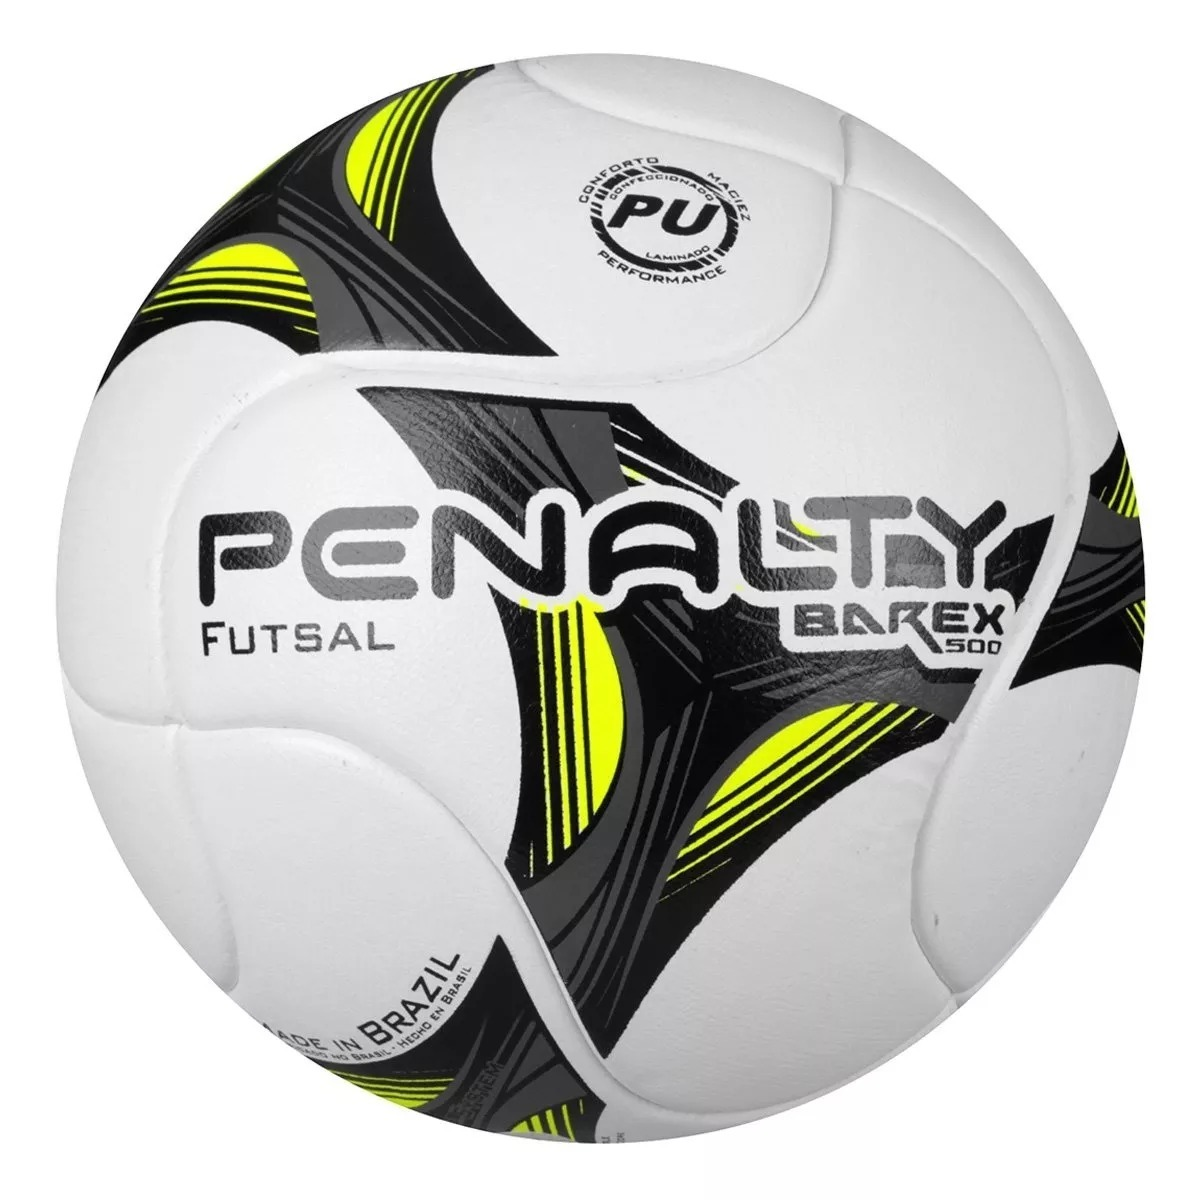 5ab9a562cb6e7 Bola De Futsal Penalty Barex 500 Termotrec - Frete Grátis - R  139 ...